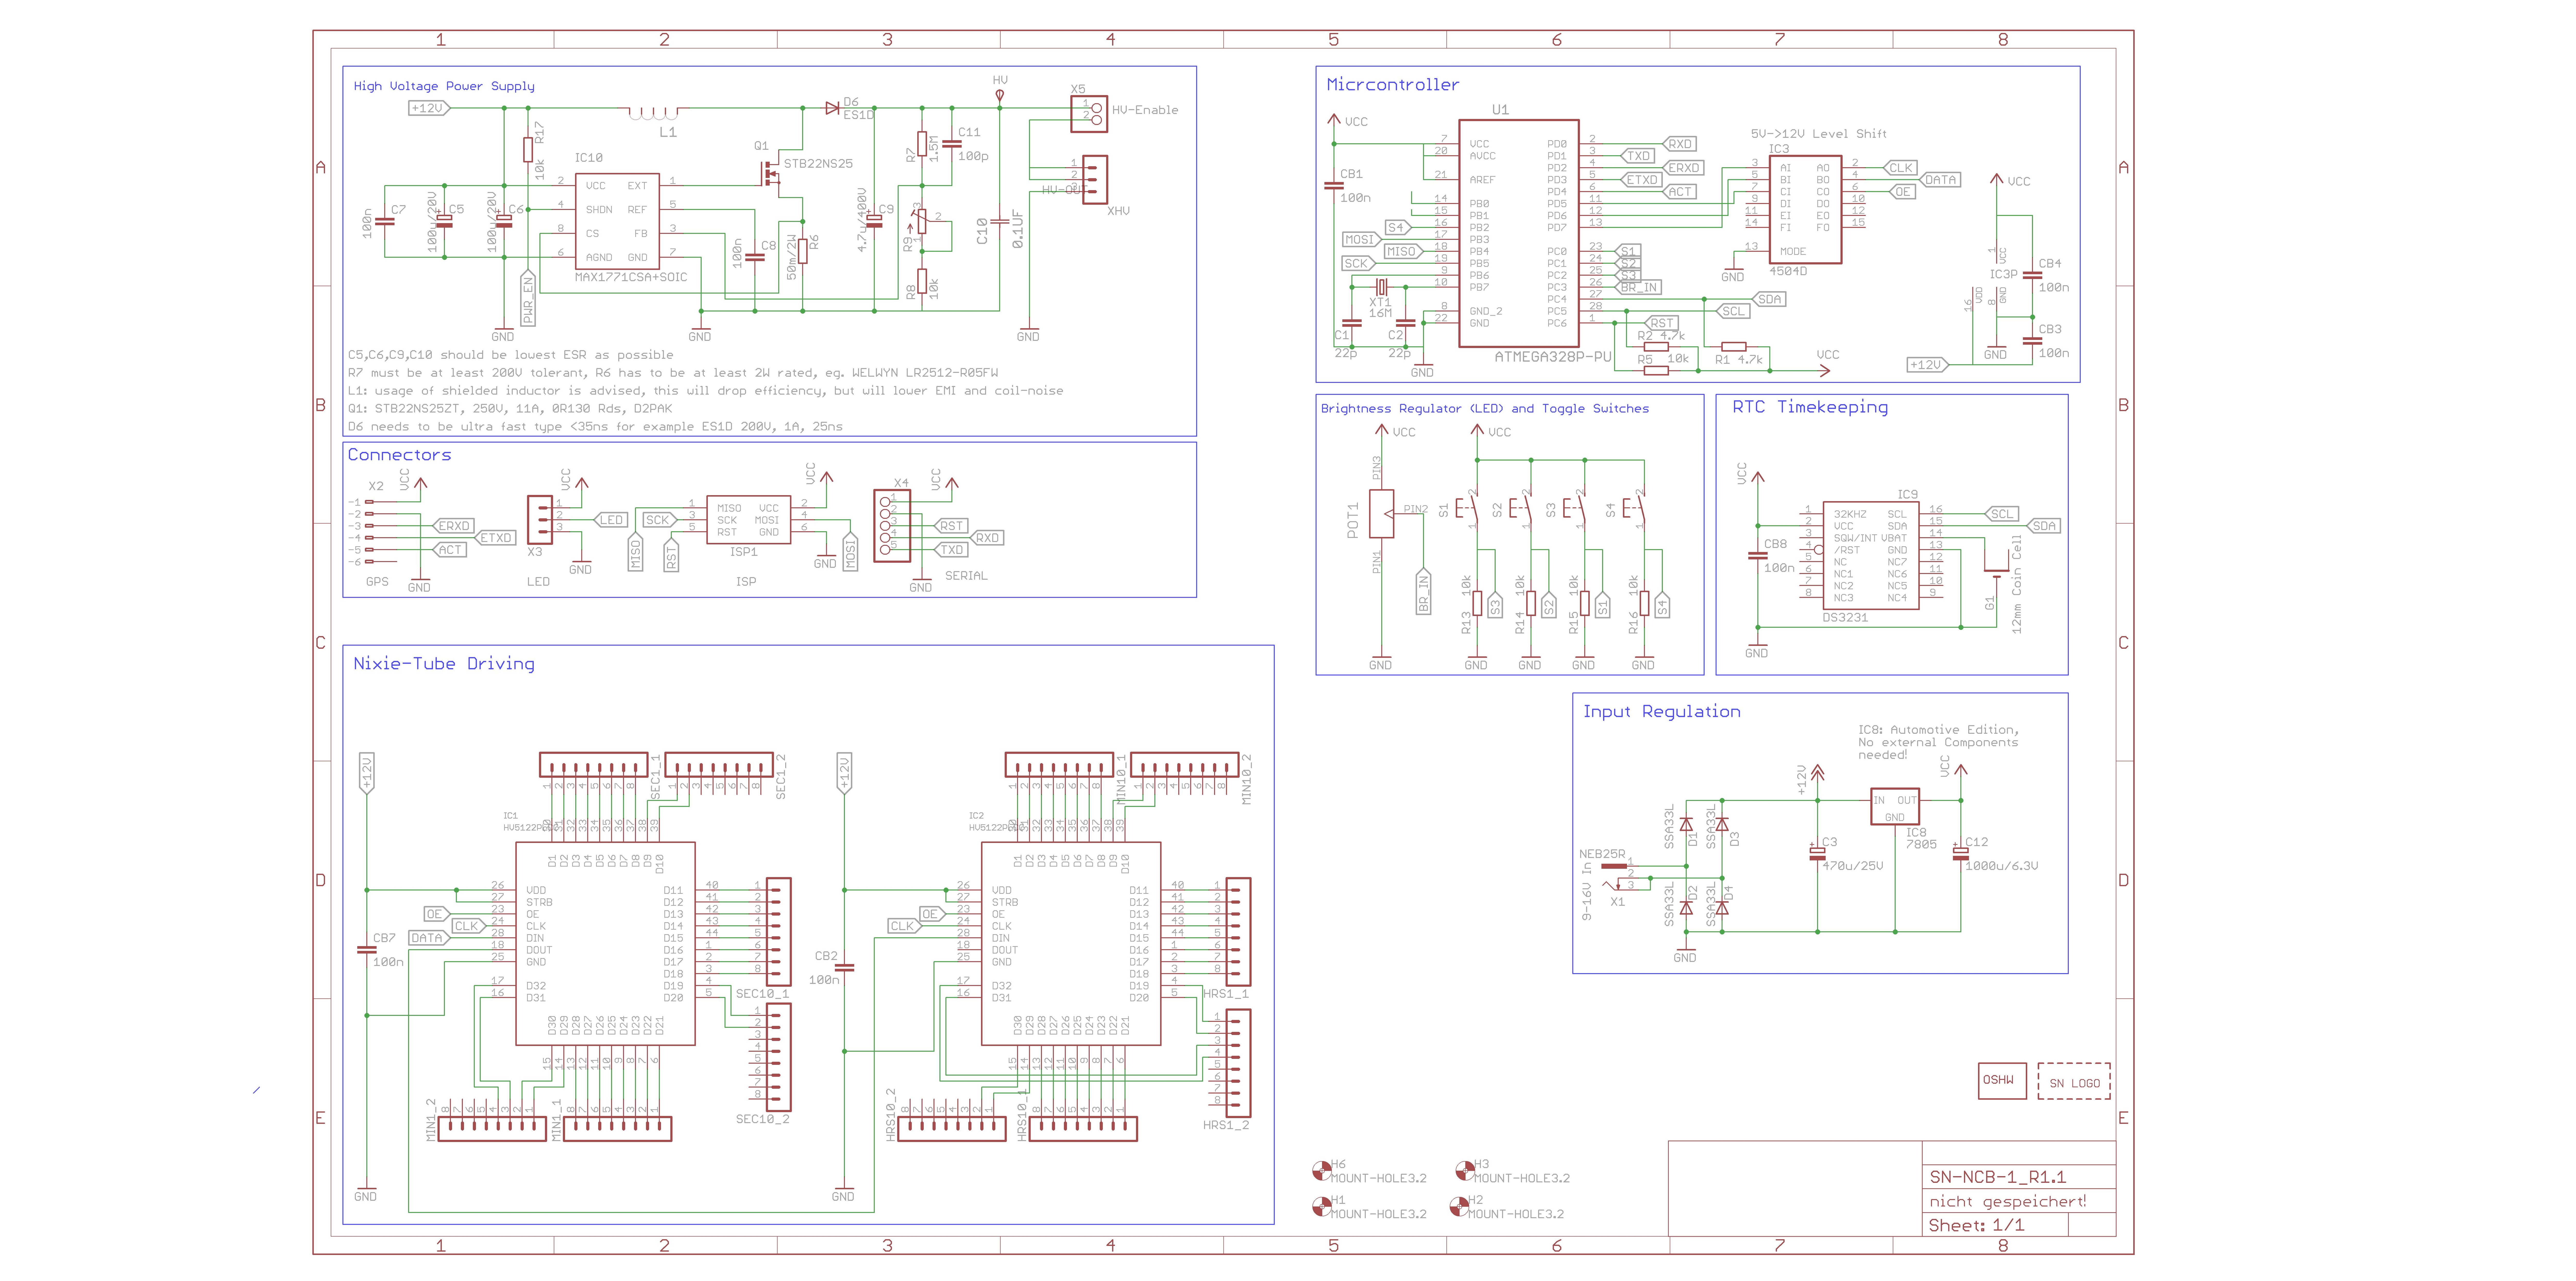 snncb1 Nixie Tube Schematic on light bulb schematic, power supply schematic, telephone schematic, capacitor schematic, liquid crystal display schematic, led schematic, current source schematic,